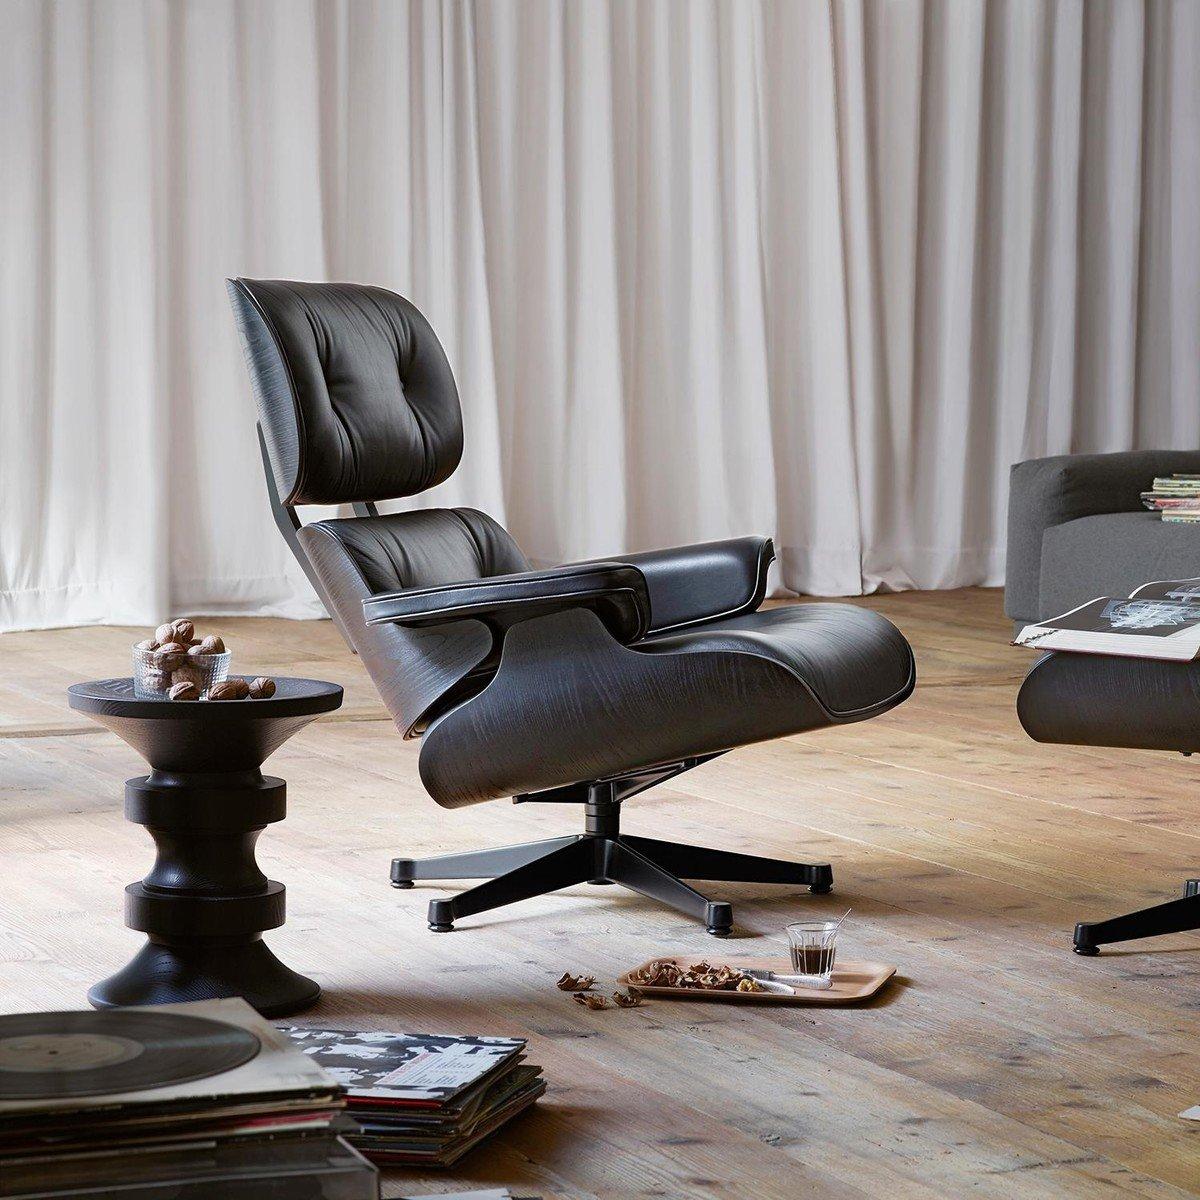 eames lounge chair drehsessel vitra. Black Bedroom Furniture Sets. Home Design Ideas